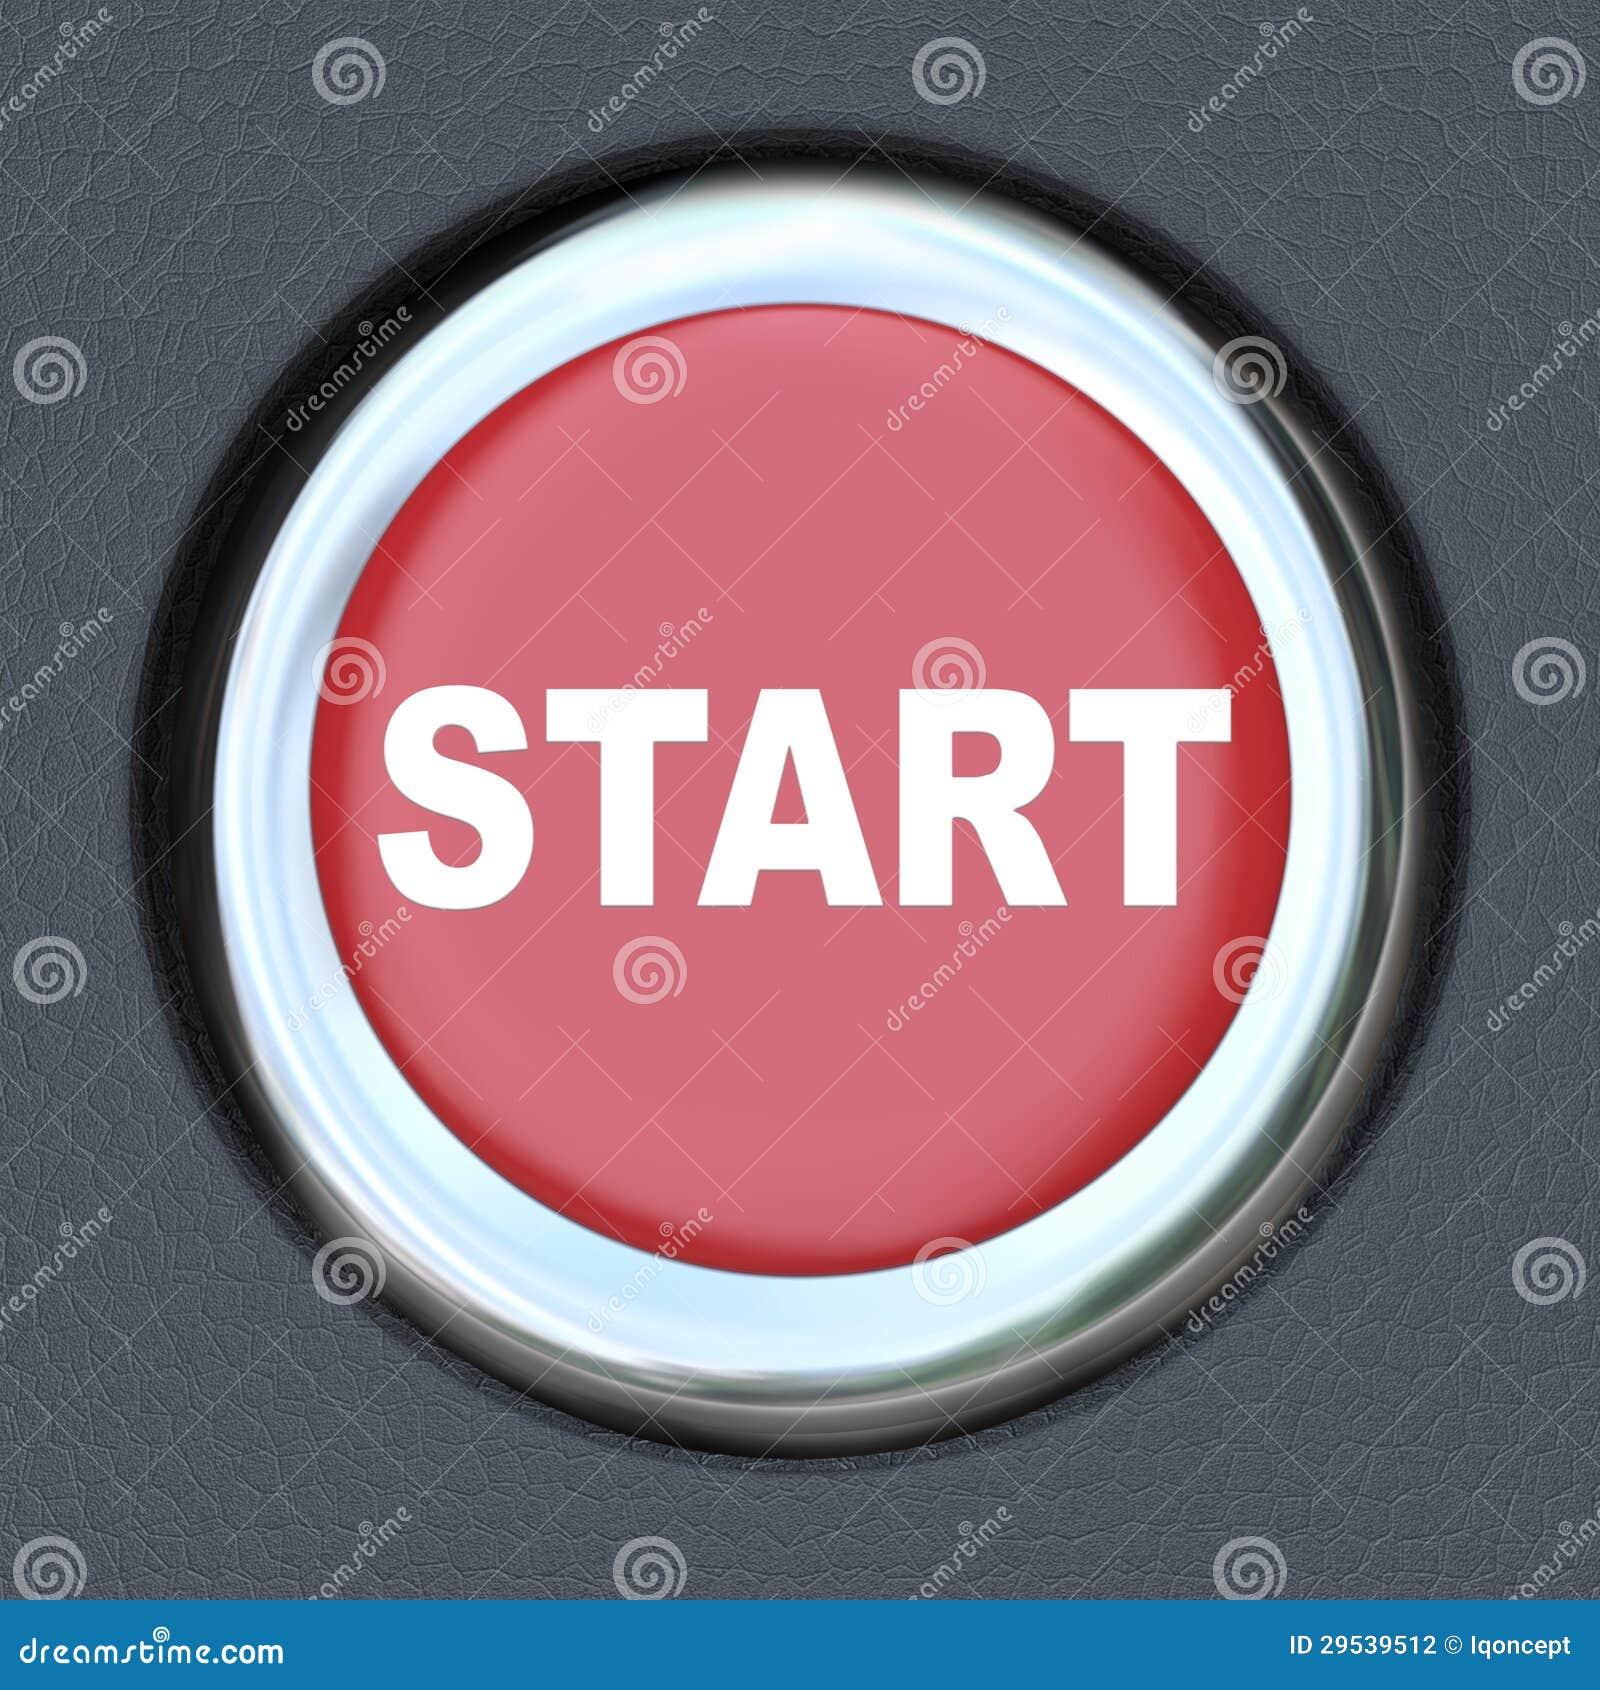 Car Push Button Starter Stock Photography